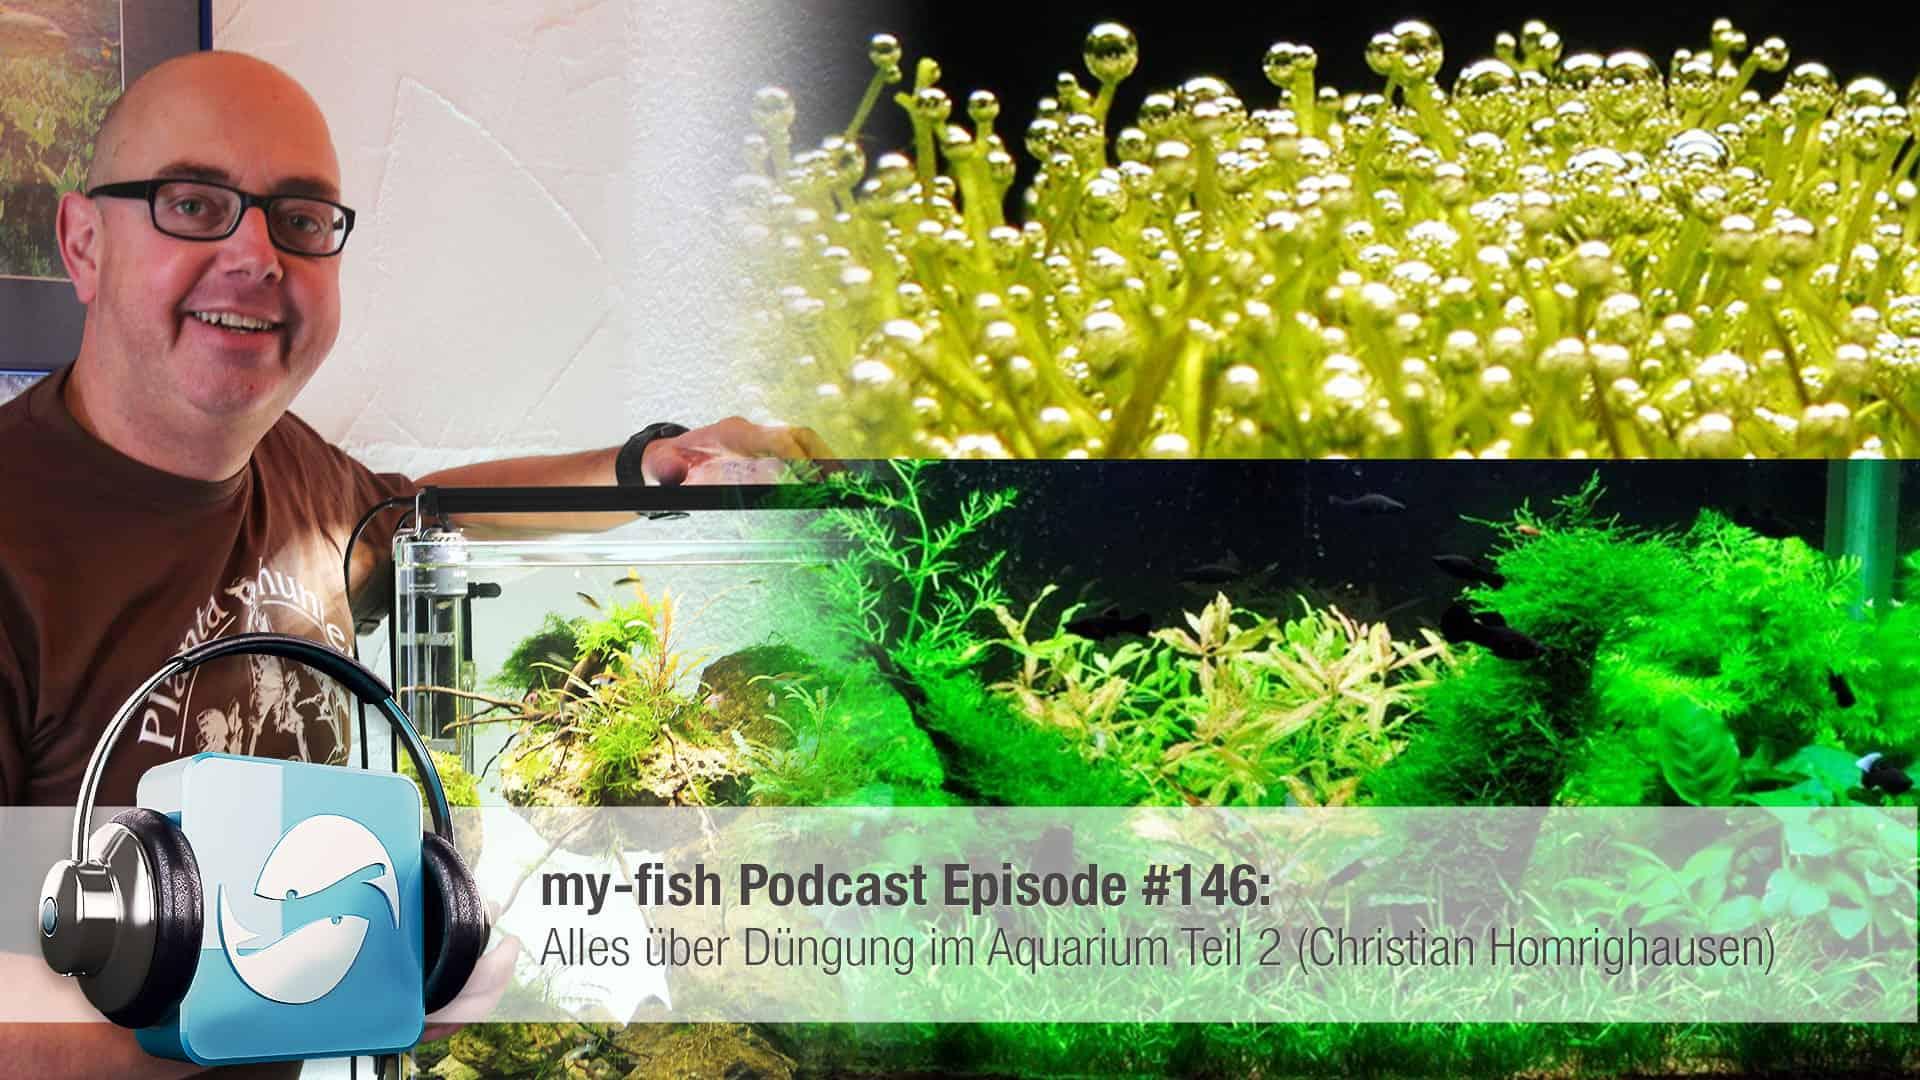 Podcast Episode #146: Alles über Düngung im Aquarium Teil 2 (Christian Homrighausen) 1